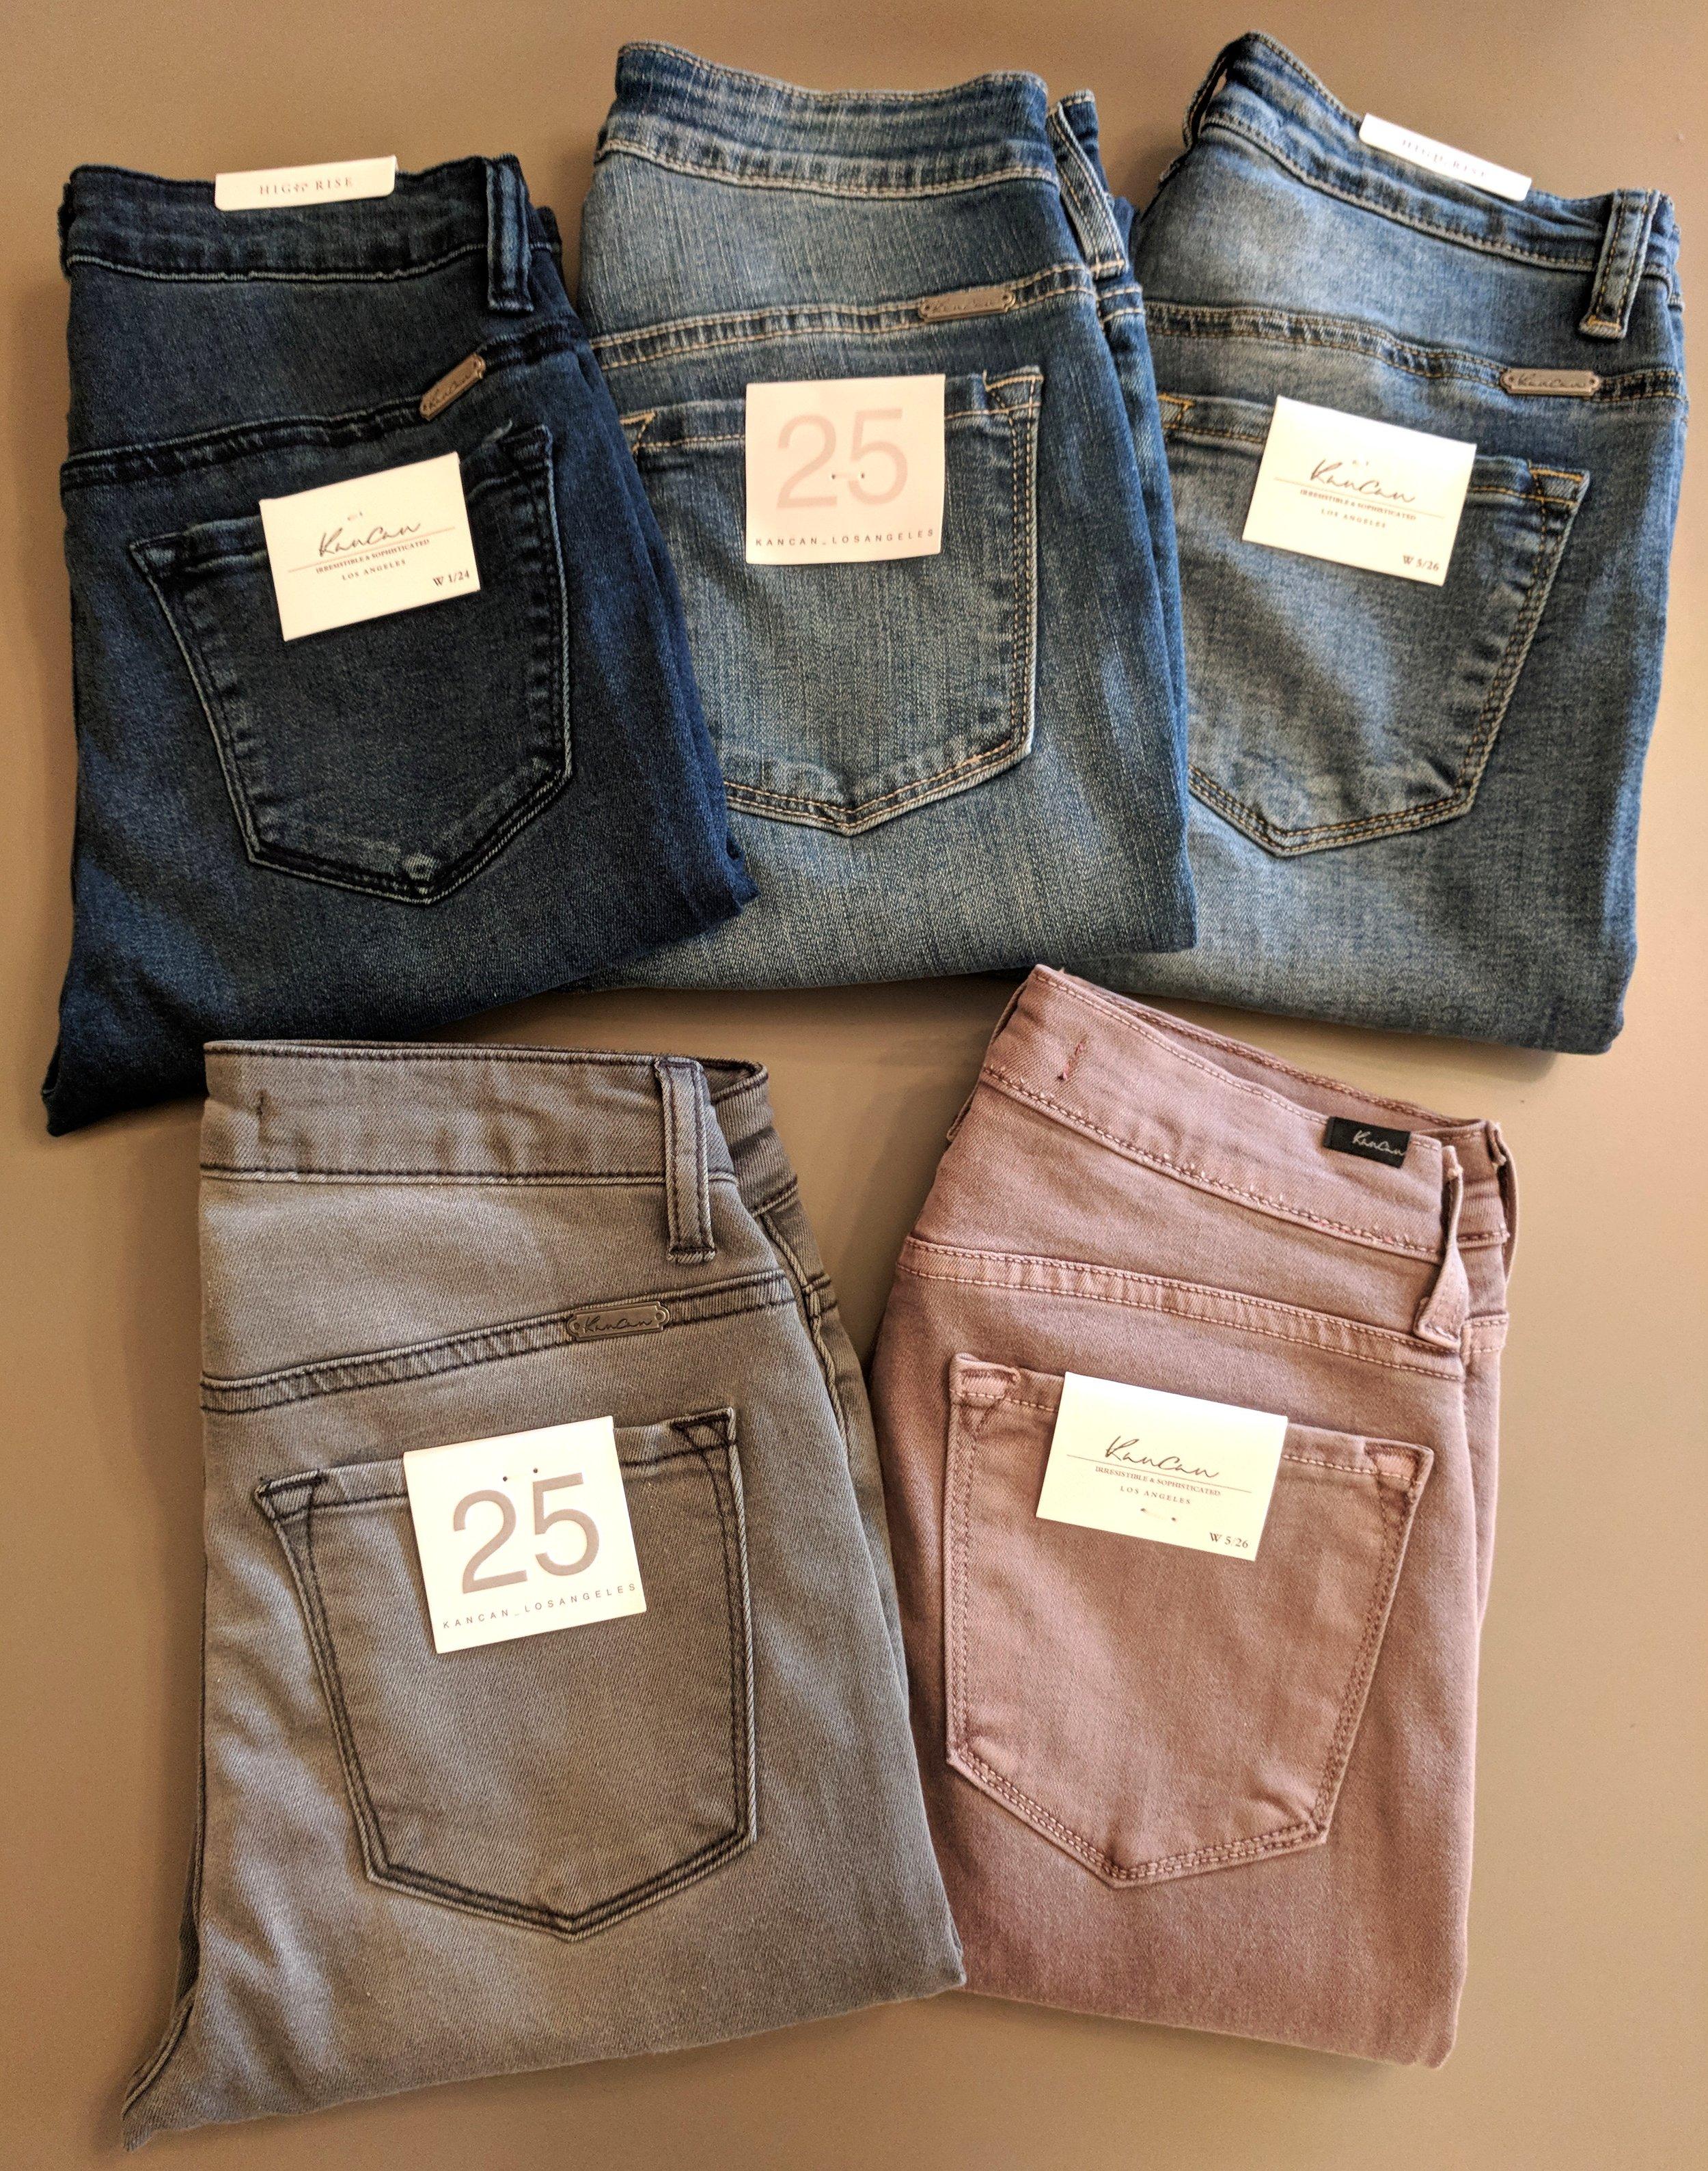 New KanCan High Rise Jeans in wood rose, grey, medium and dark wash demin $52